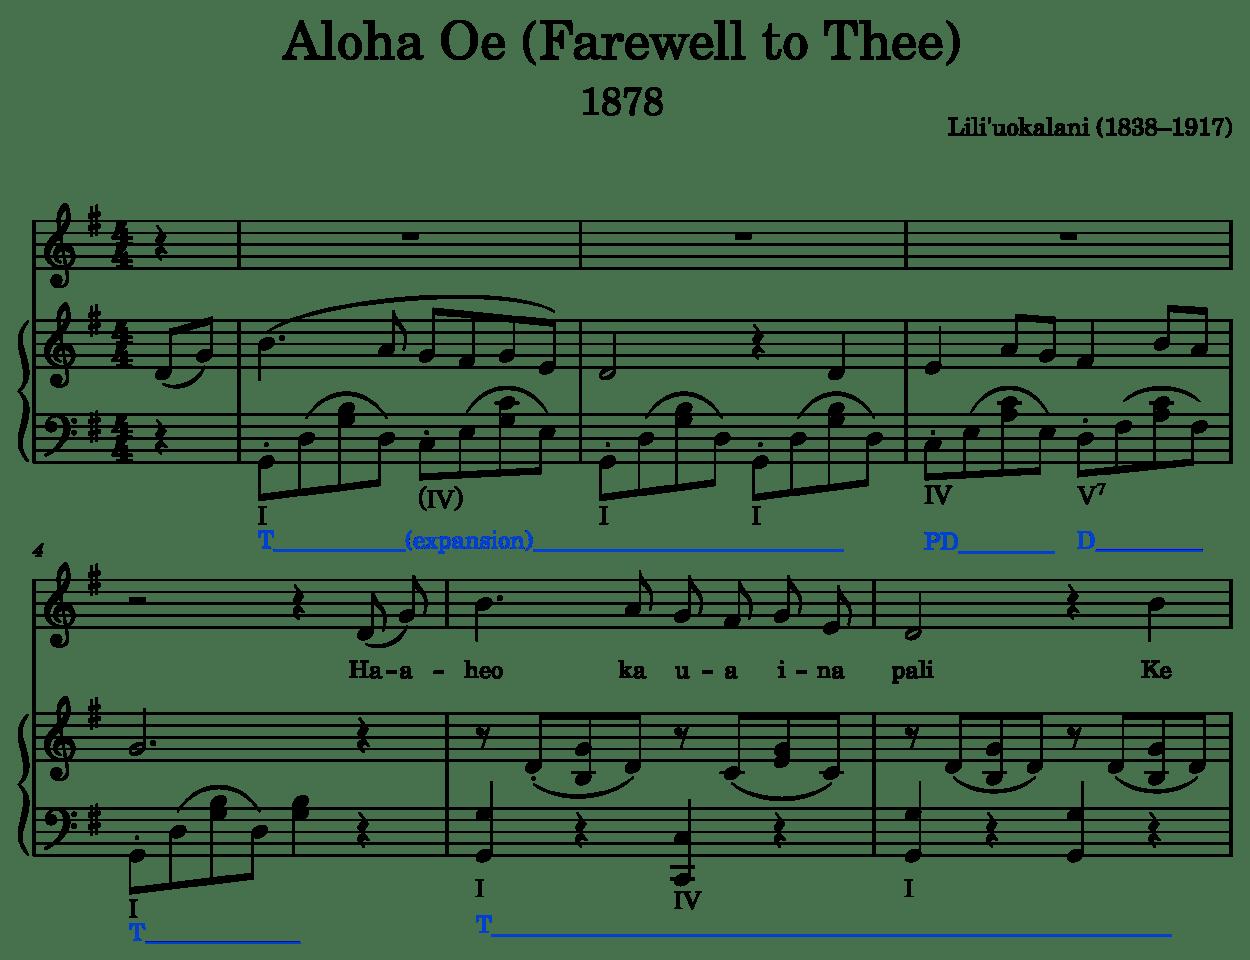 Aloha Oe as an example of tonic expansion (prolongation)